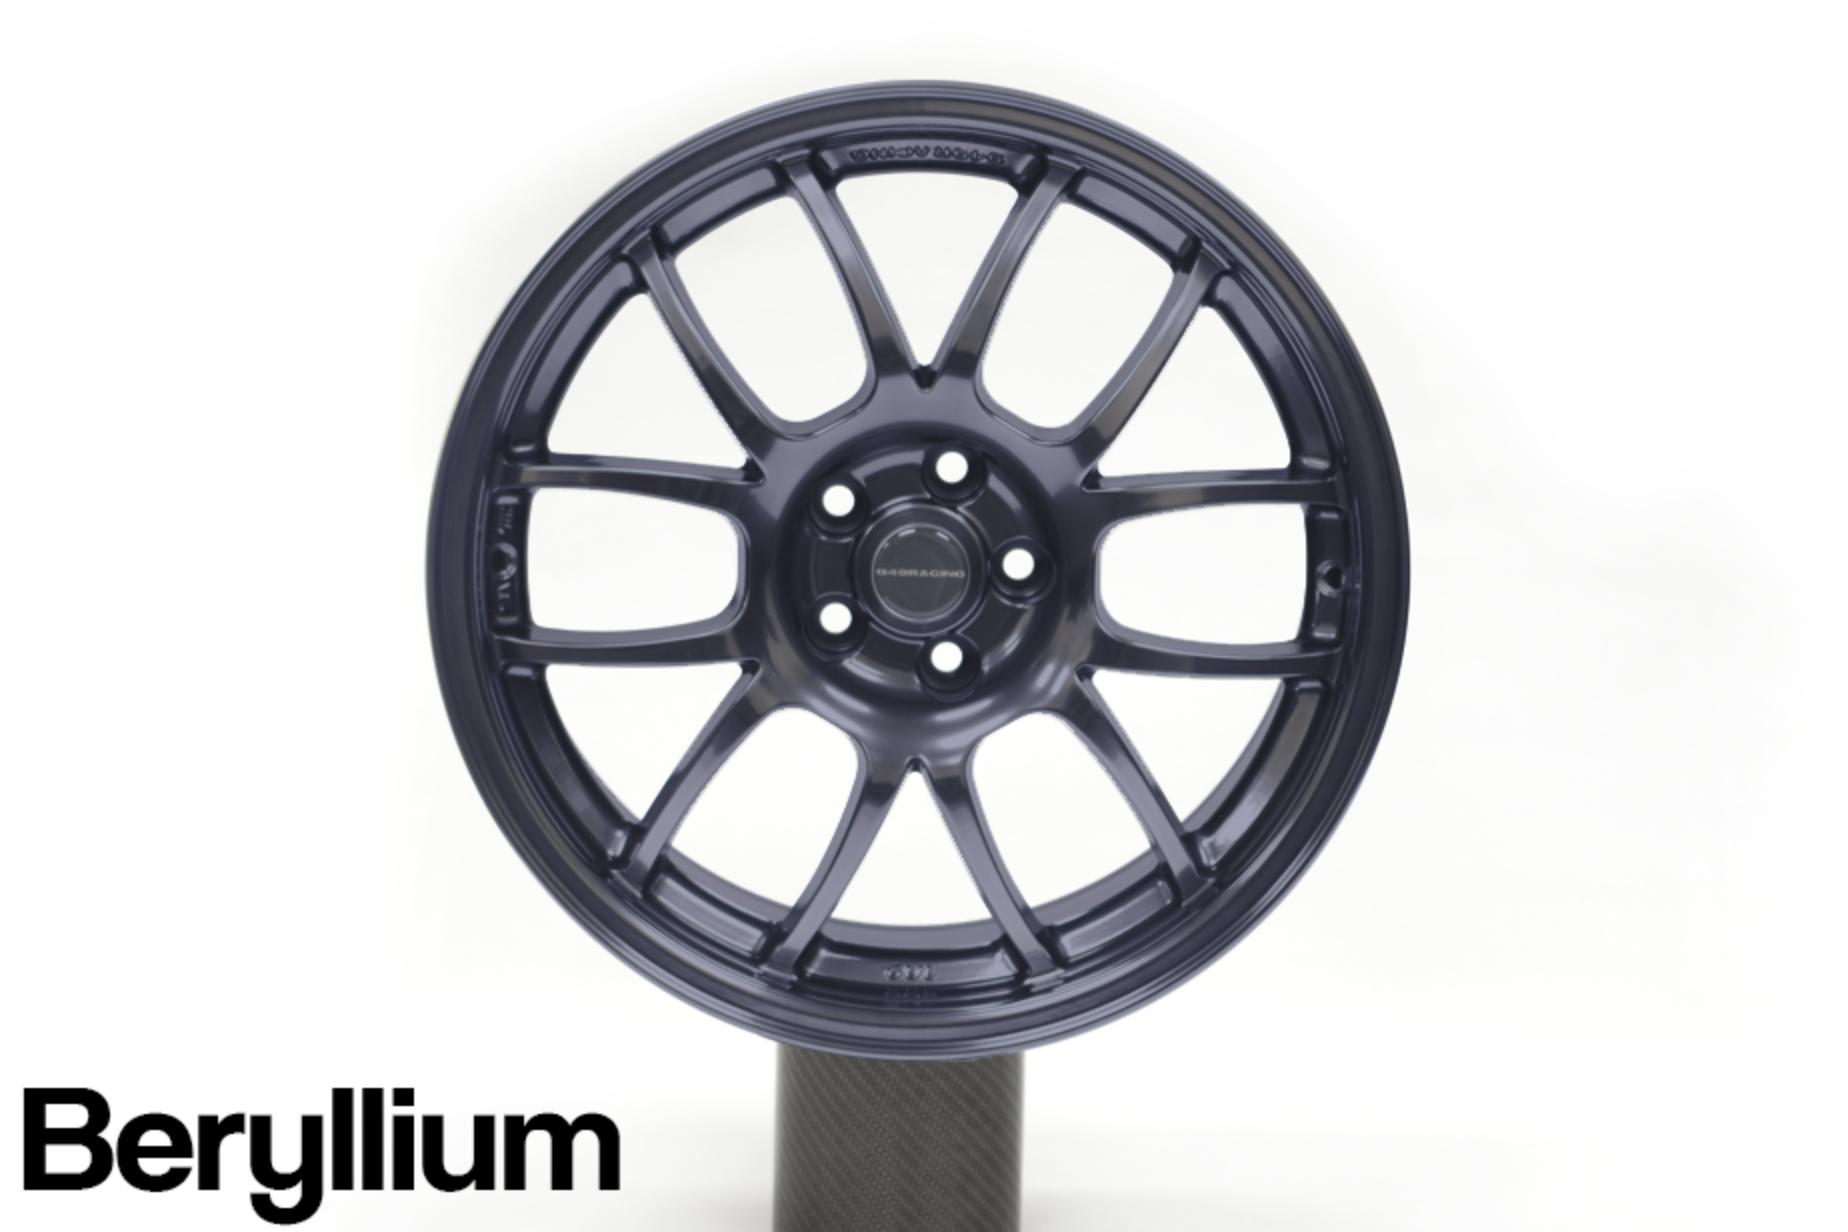 949 Racing 6UL 17x9 +40mm Beryllium - 2013+ FR-S / BRZ / 86 / 2014+ Forester